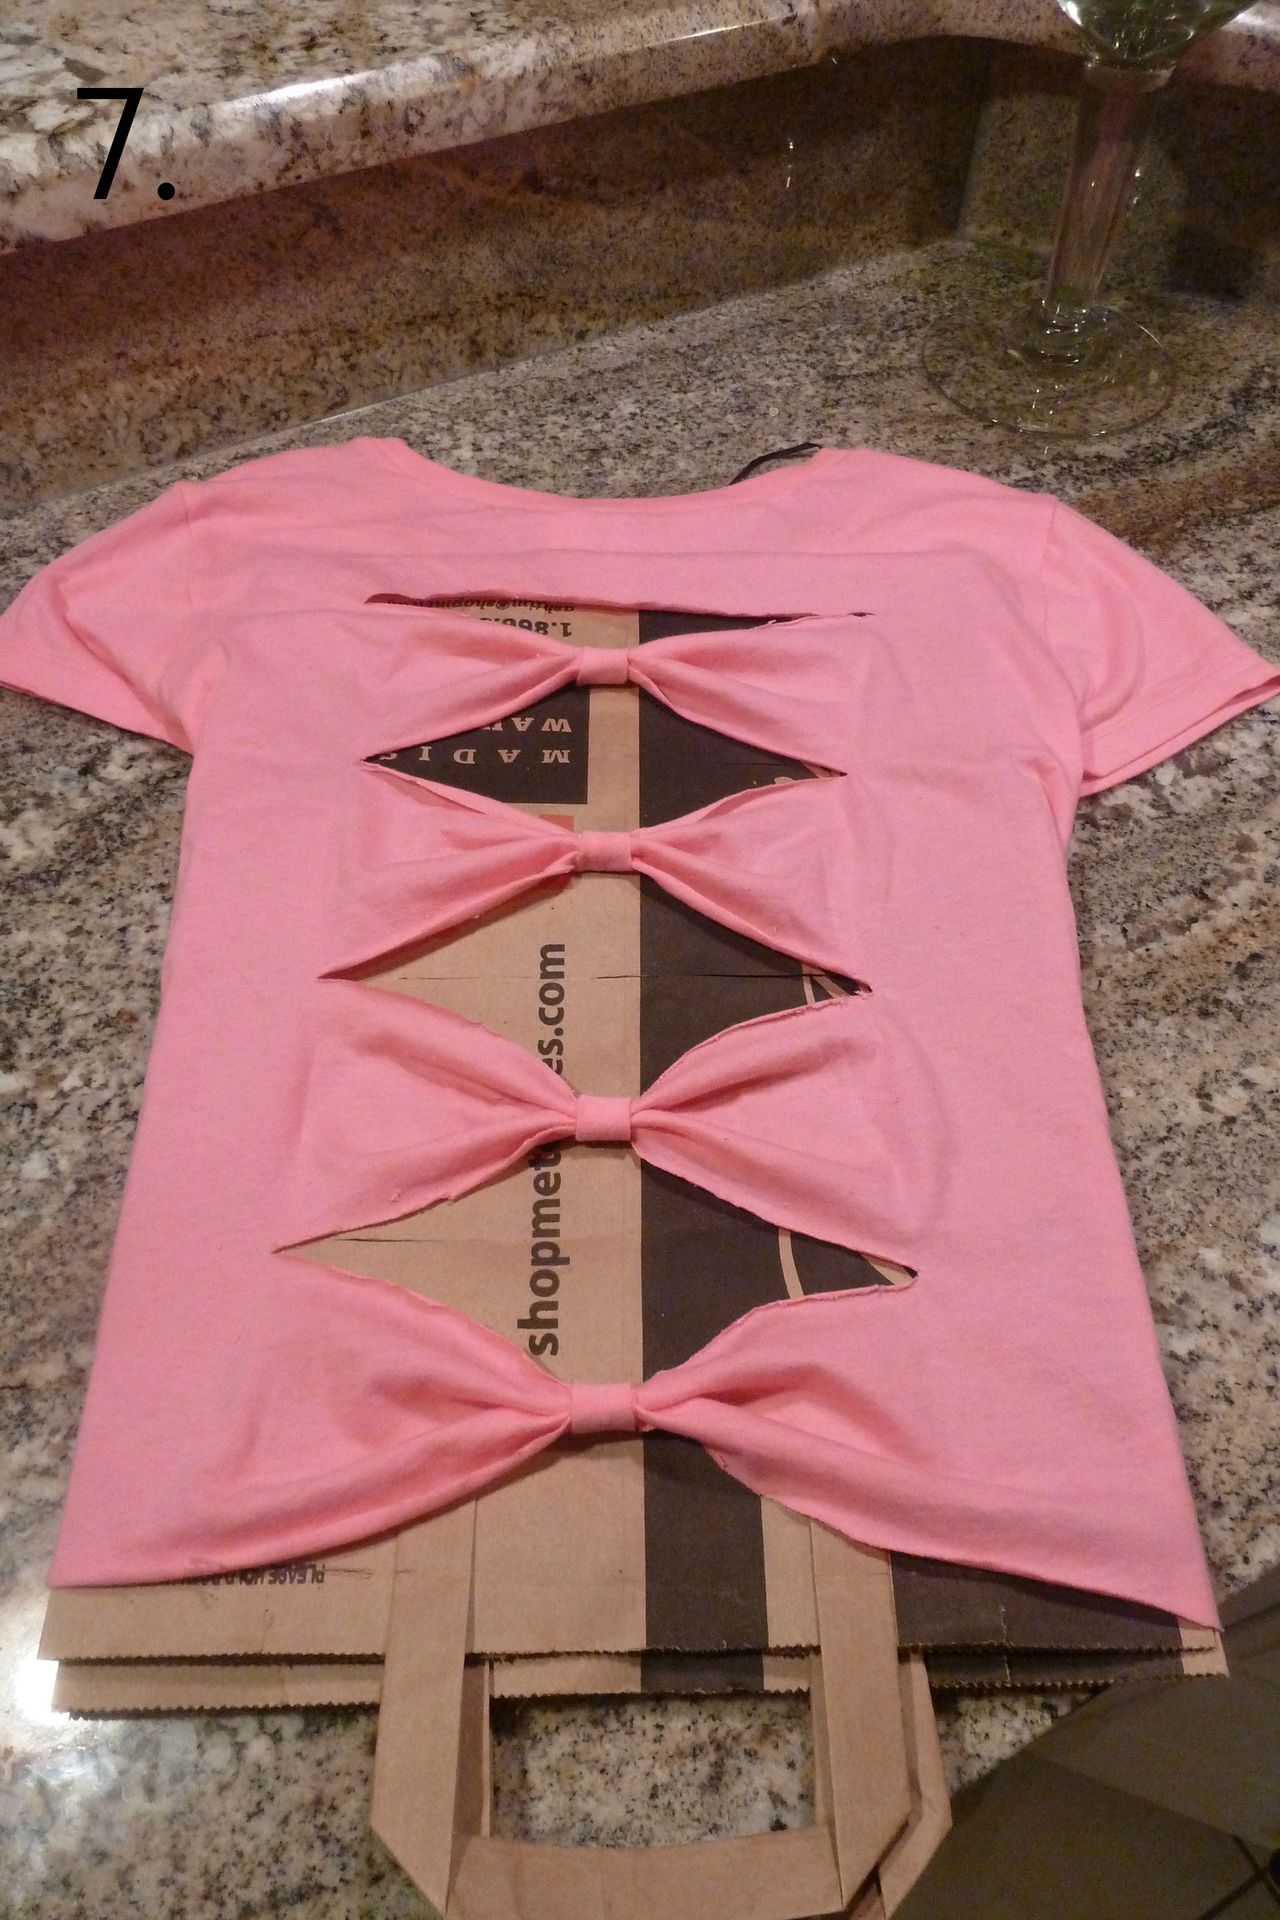 How To Make A Bow Back Shirt Diy fashion, Diy clothes